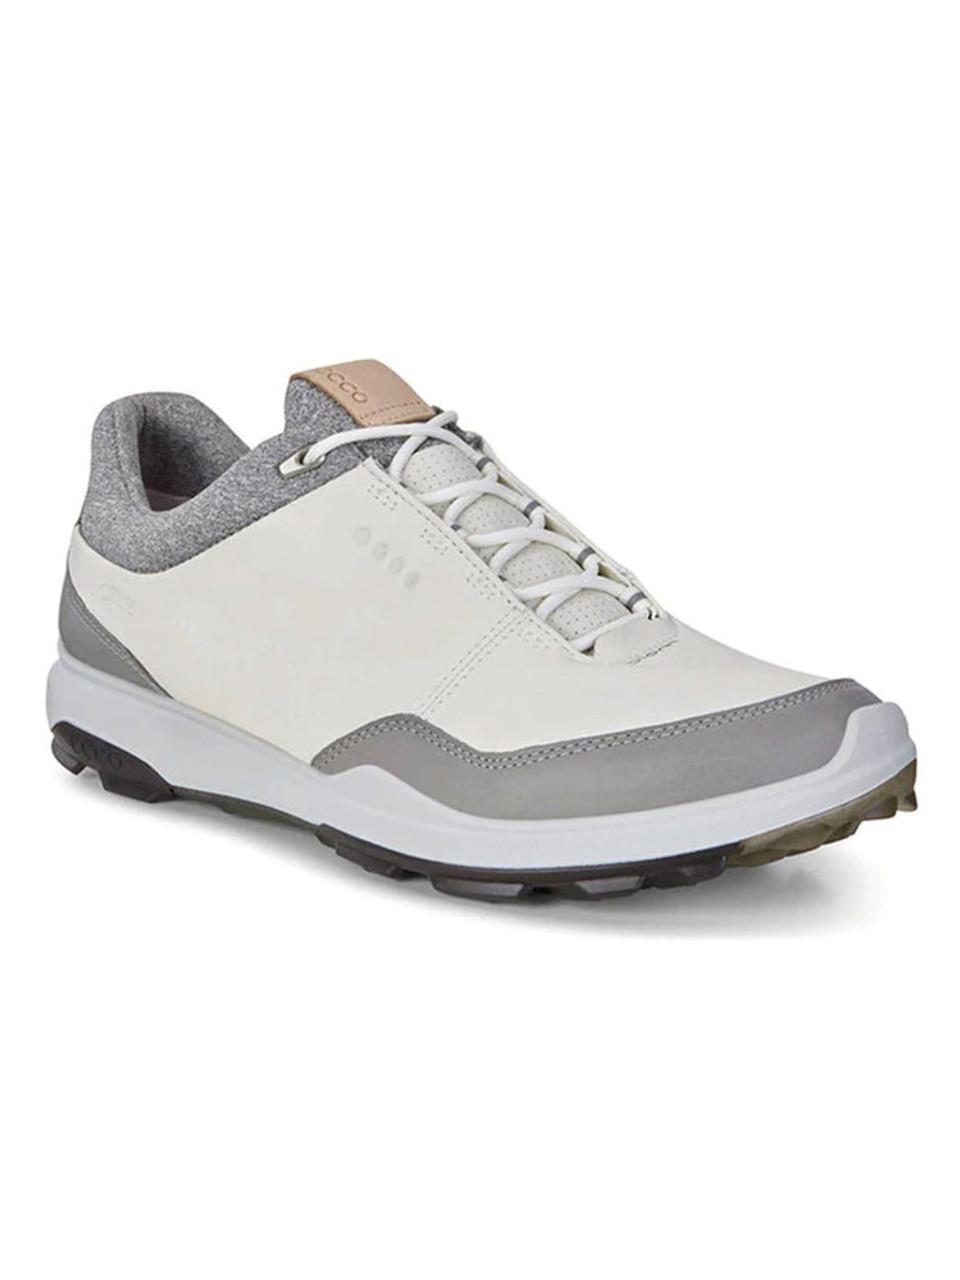 cd45b4d506 Ecco Biom Golf Club Hybrid 3 Golf Shoes - White/Black - Mens For ...